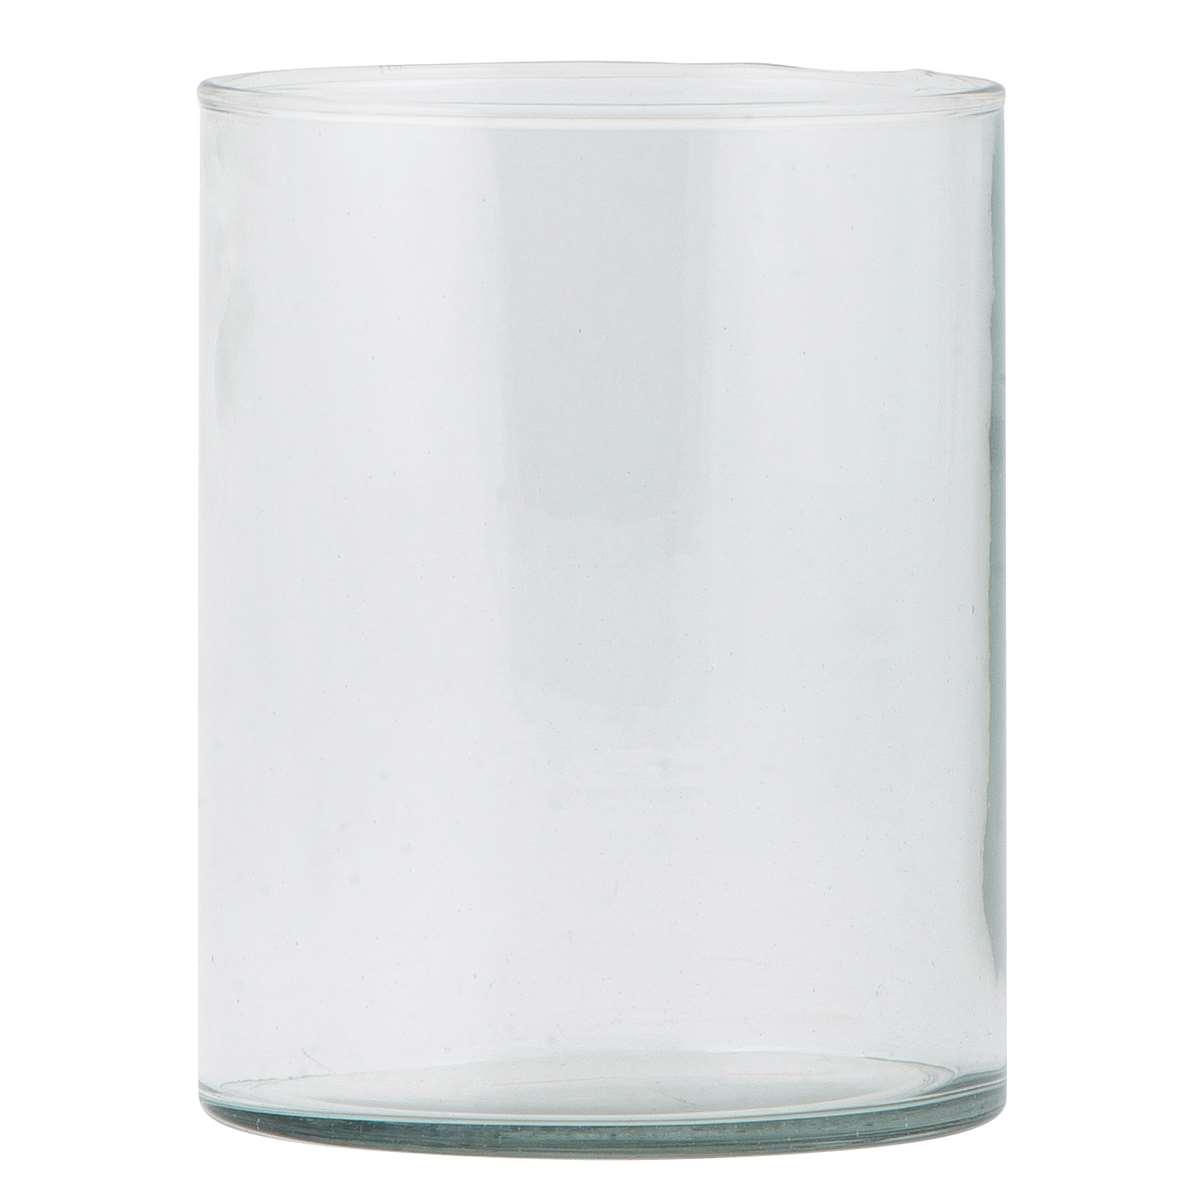 windlicht aus glas 18 5 cm. Black Bedroom Furniture Sets. Home Design Ideas